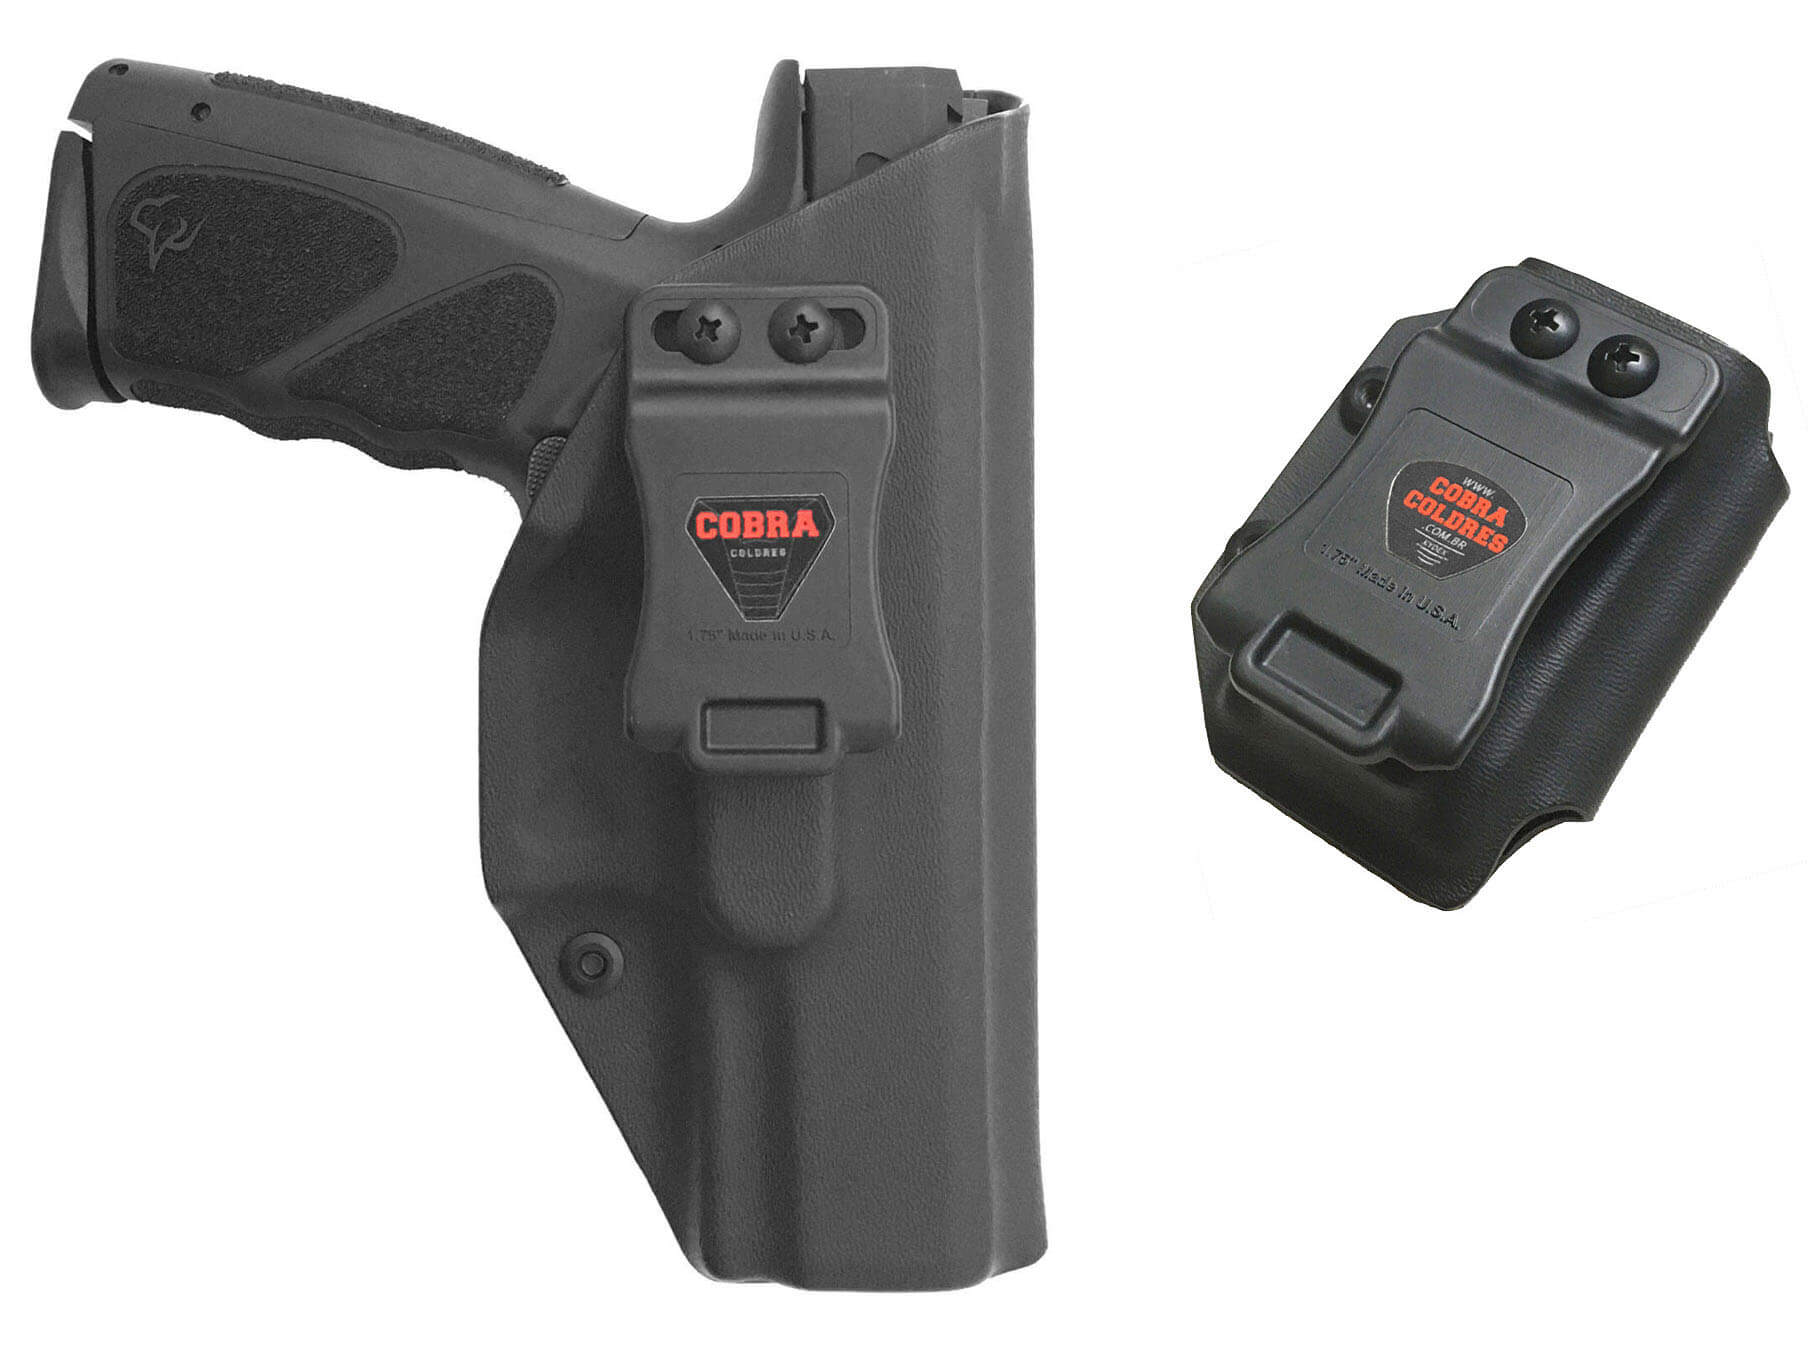 Coldre [TS9] [TS] Kydex® + Porta-Carregador - Taurus Striker - Slim - Saque Rápido Velado - 080